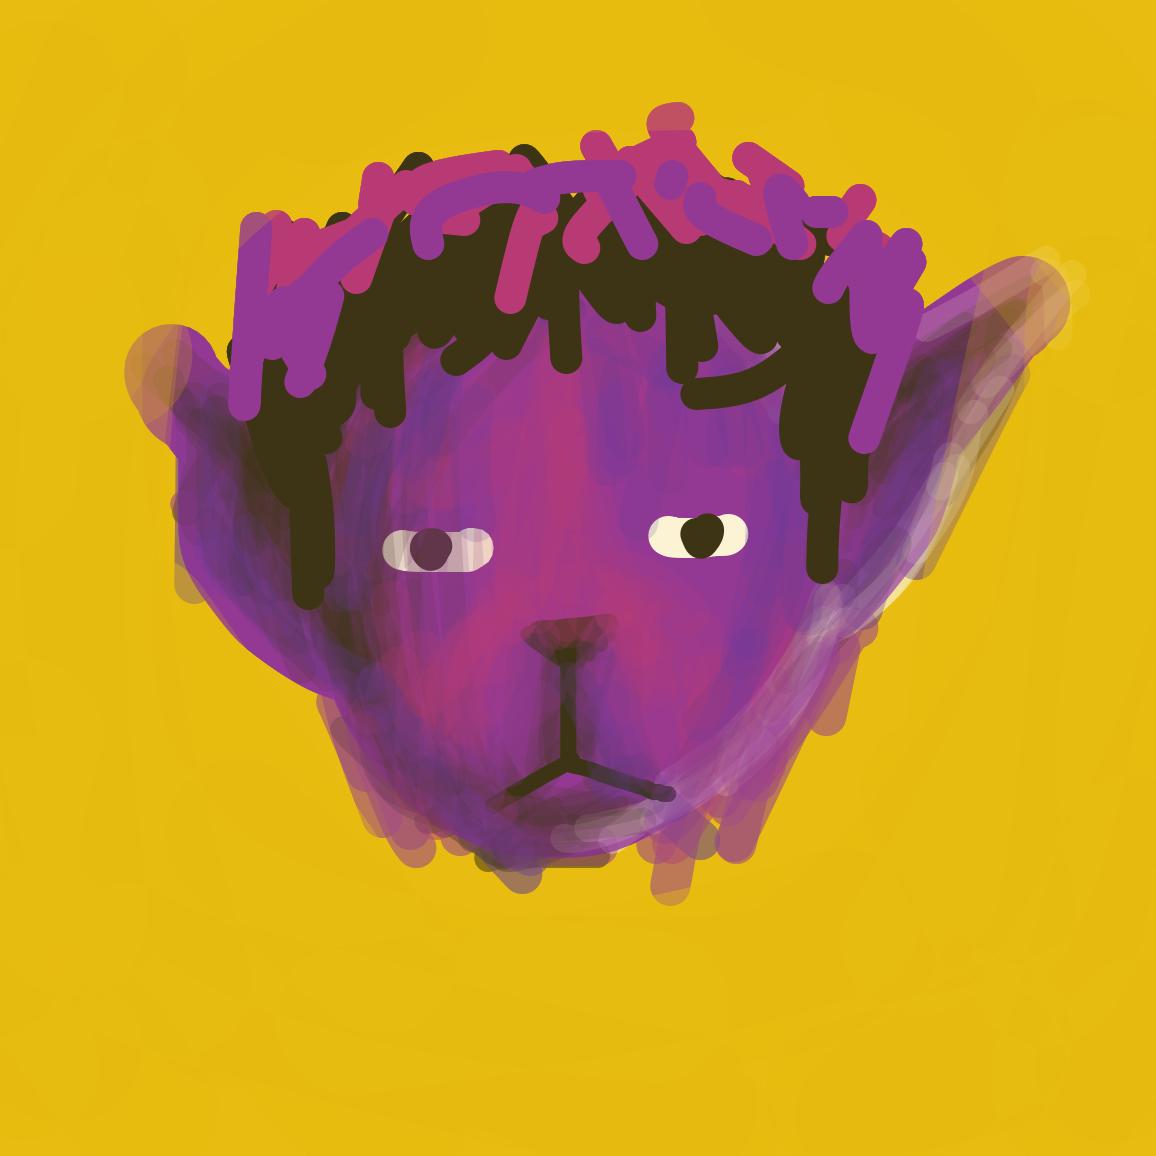 Profile picture by the comic artist Purple Alien